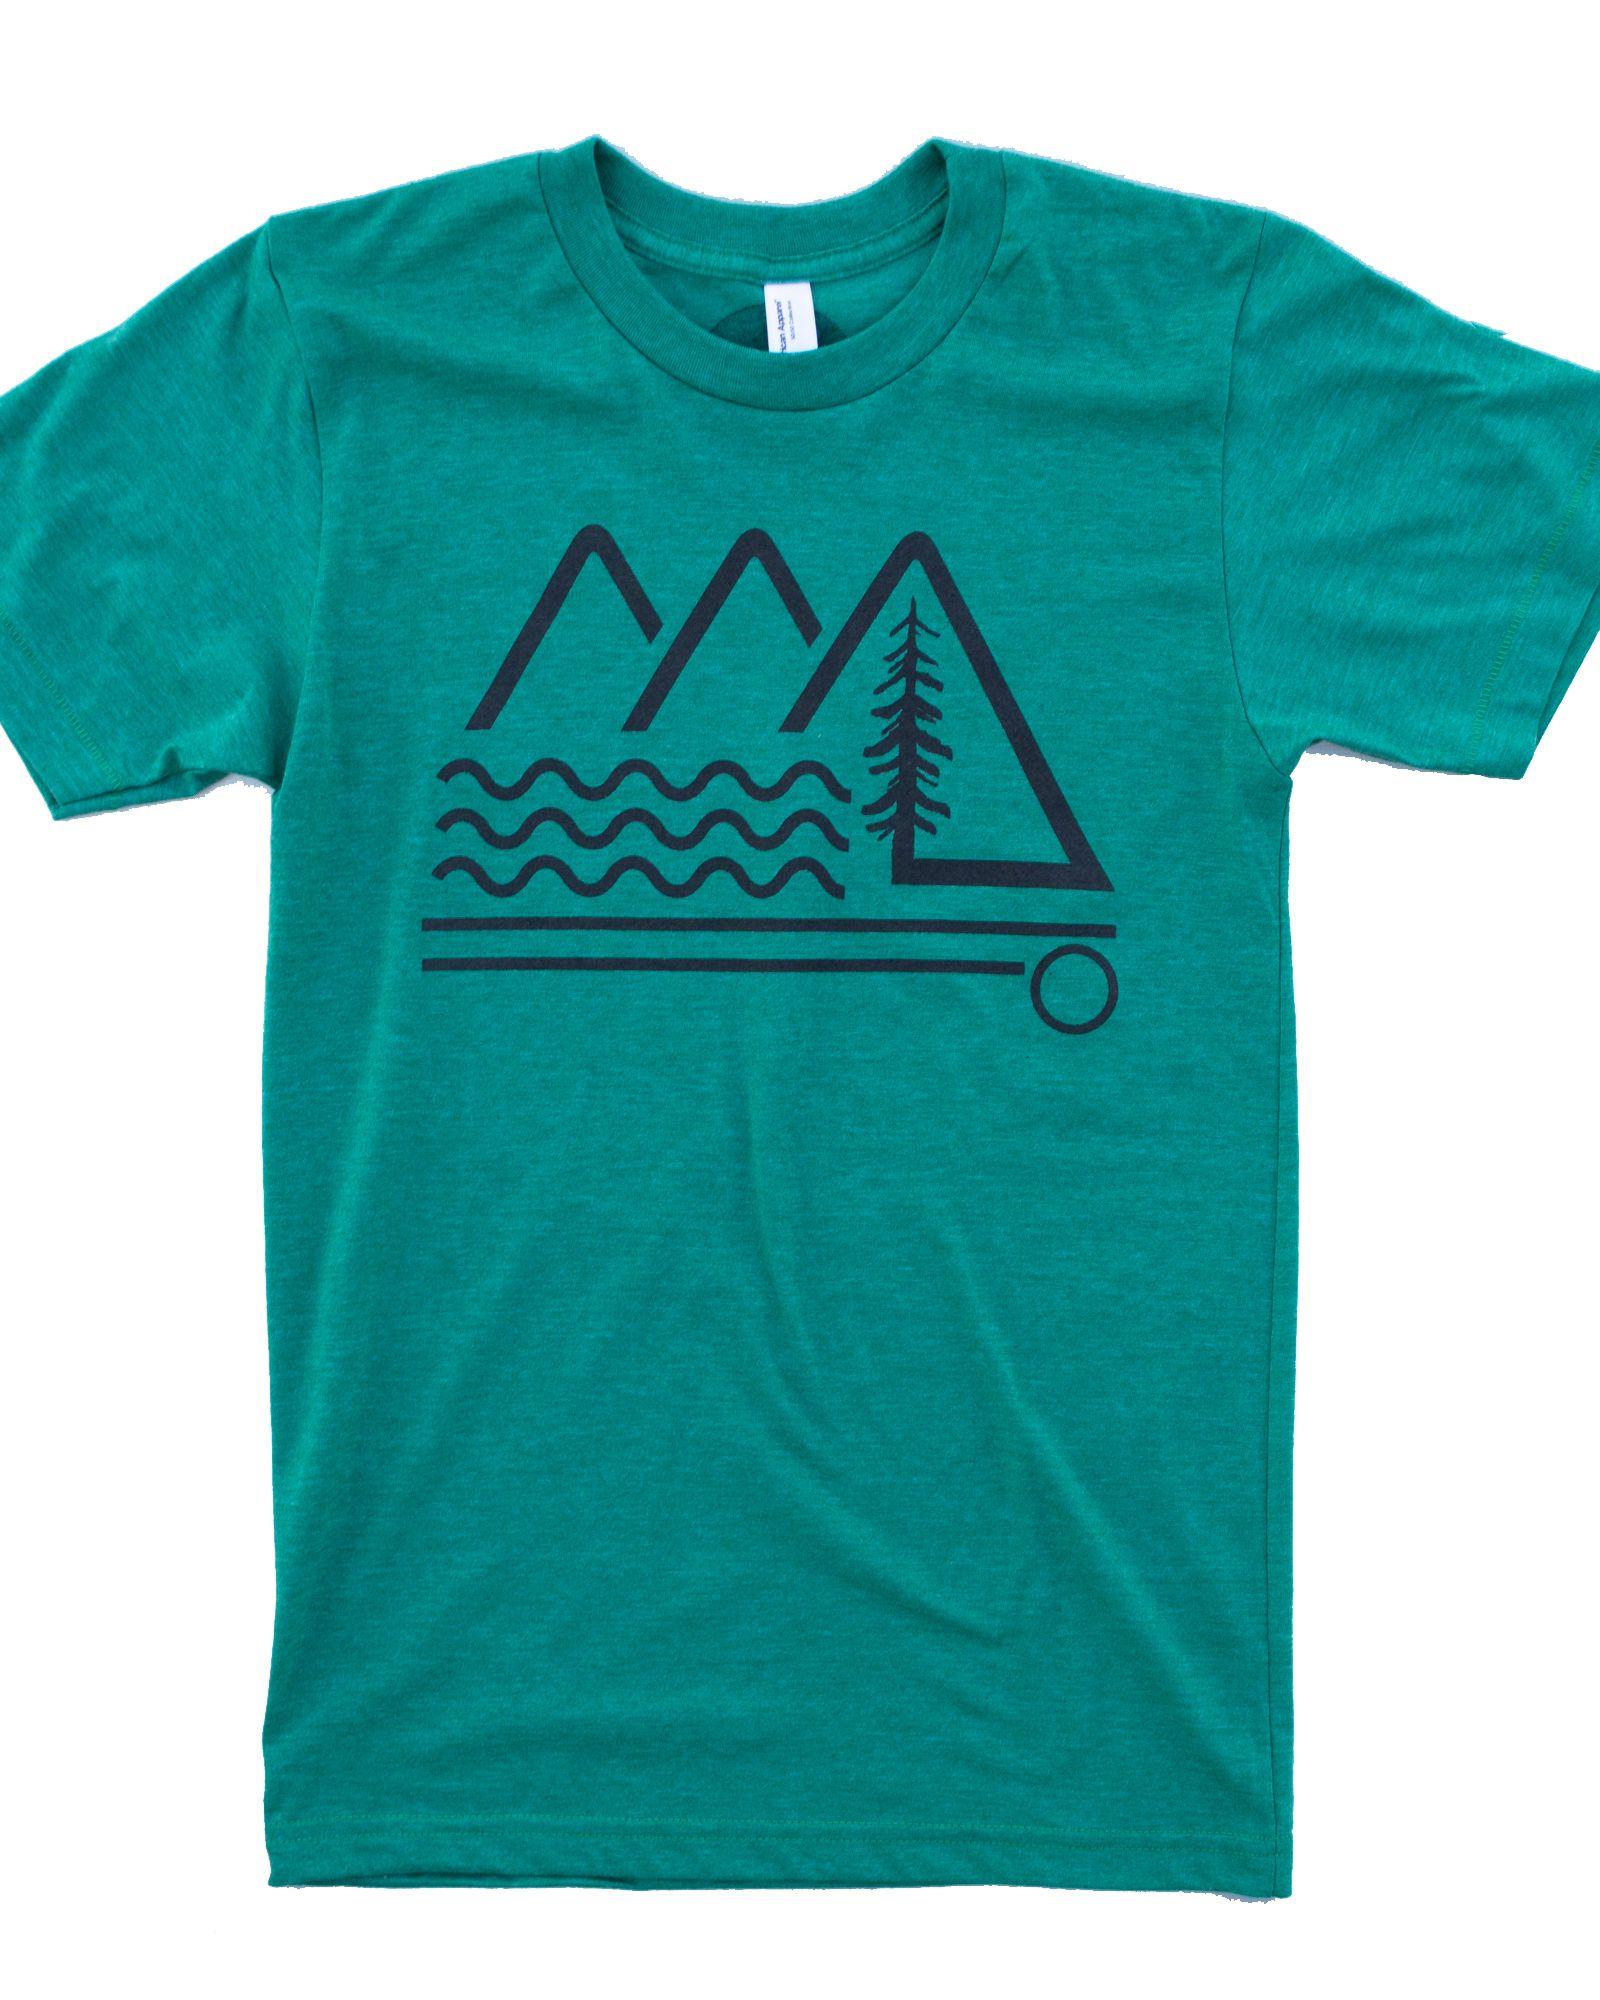 aeefda7d8350d Vintage Green mountain shirt, print on American Apparel tee ...